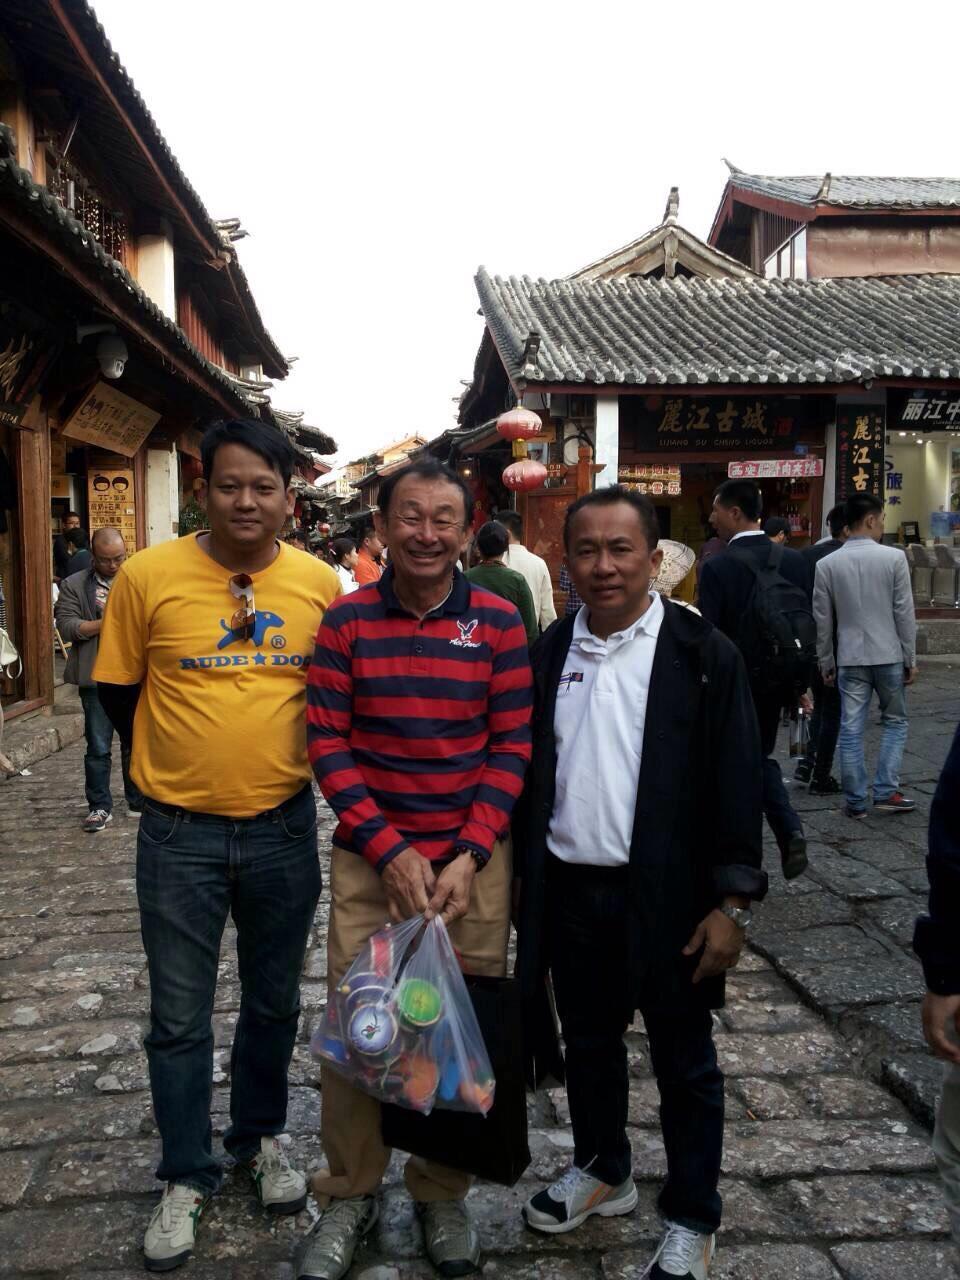 AGROMED นำลูกค้าท่องเที่ยว ต้าหลี่-ลี่เจียง-แชงกรีล่า 19 - 24 Mar 2015